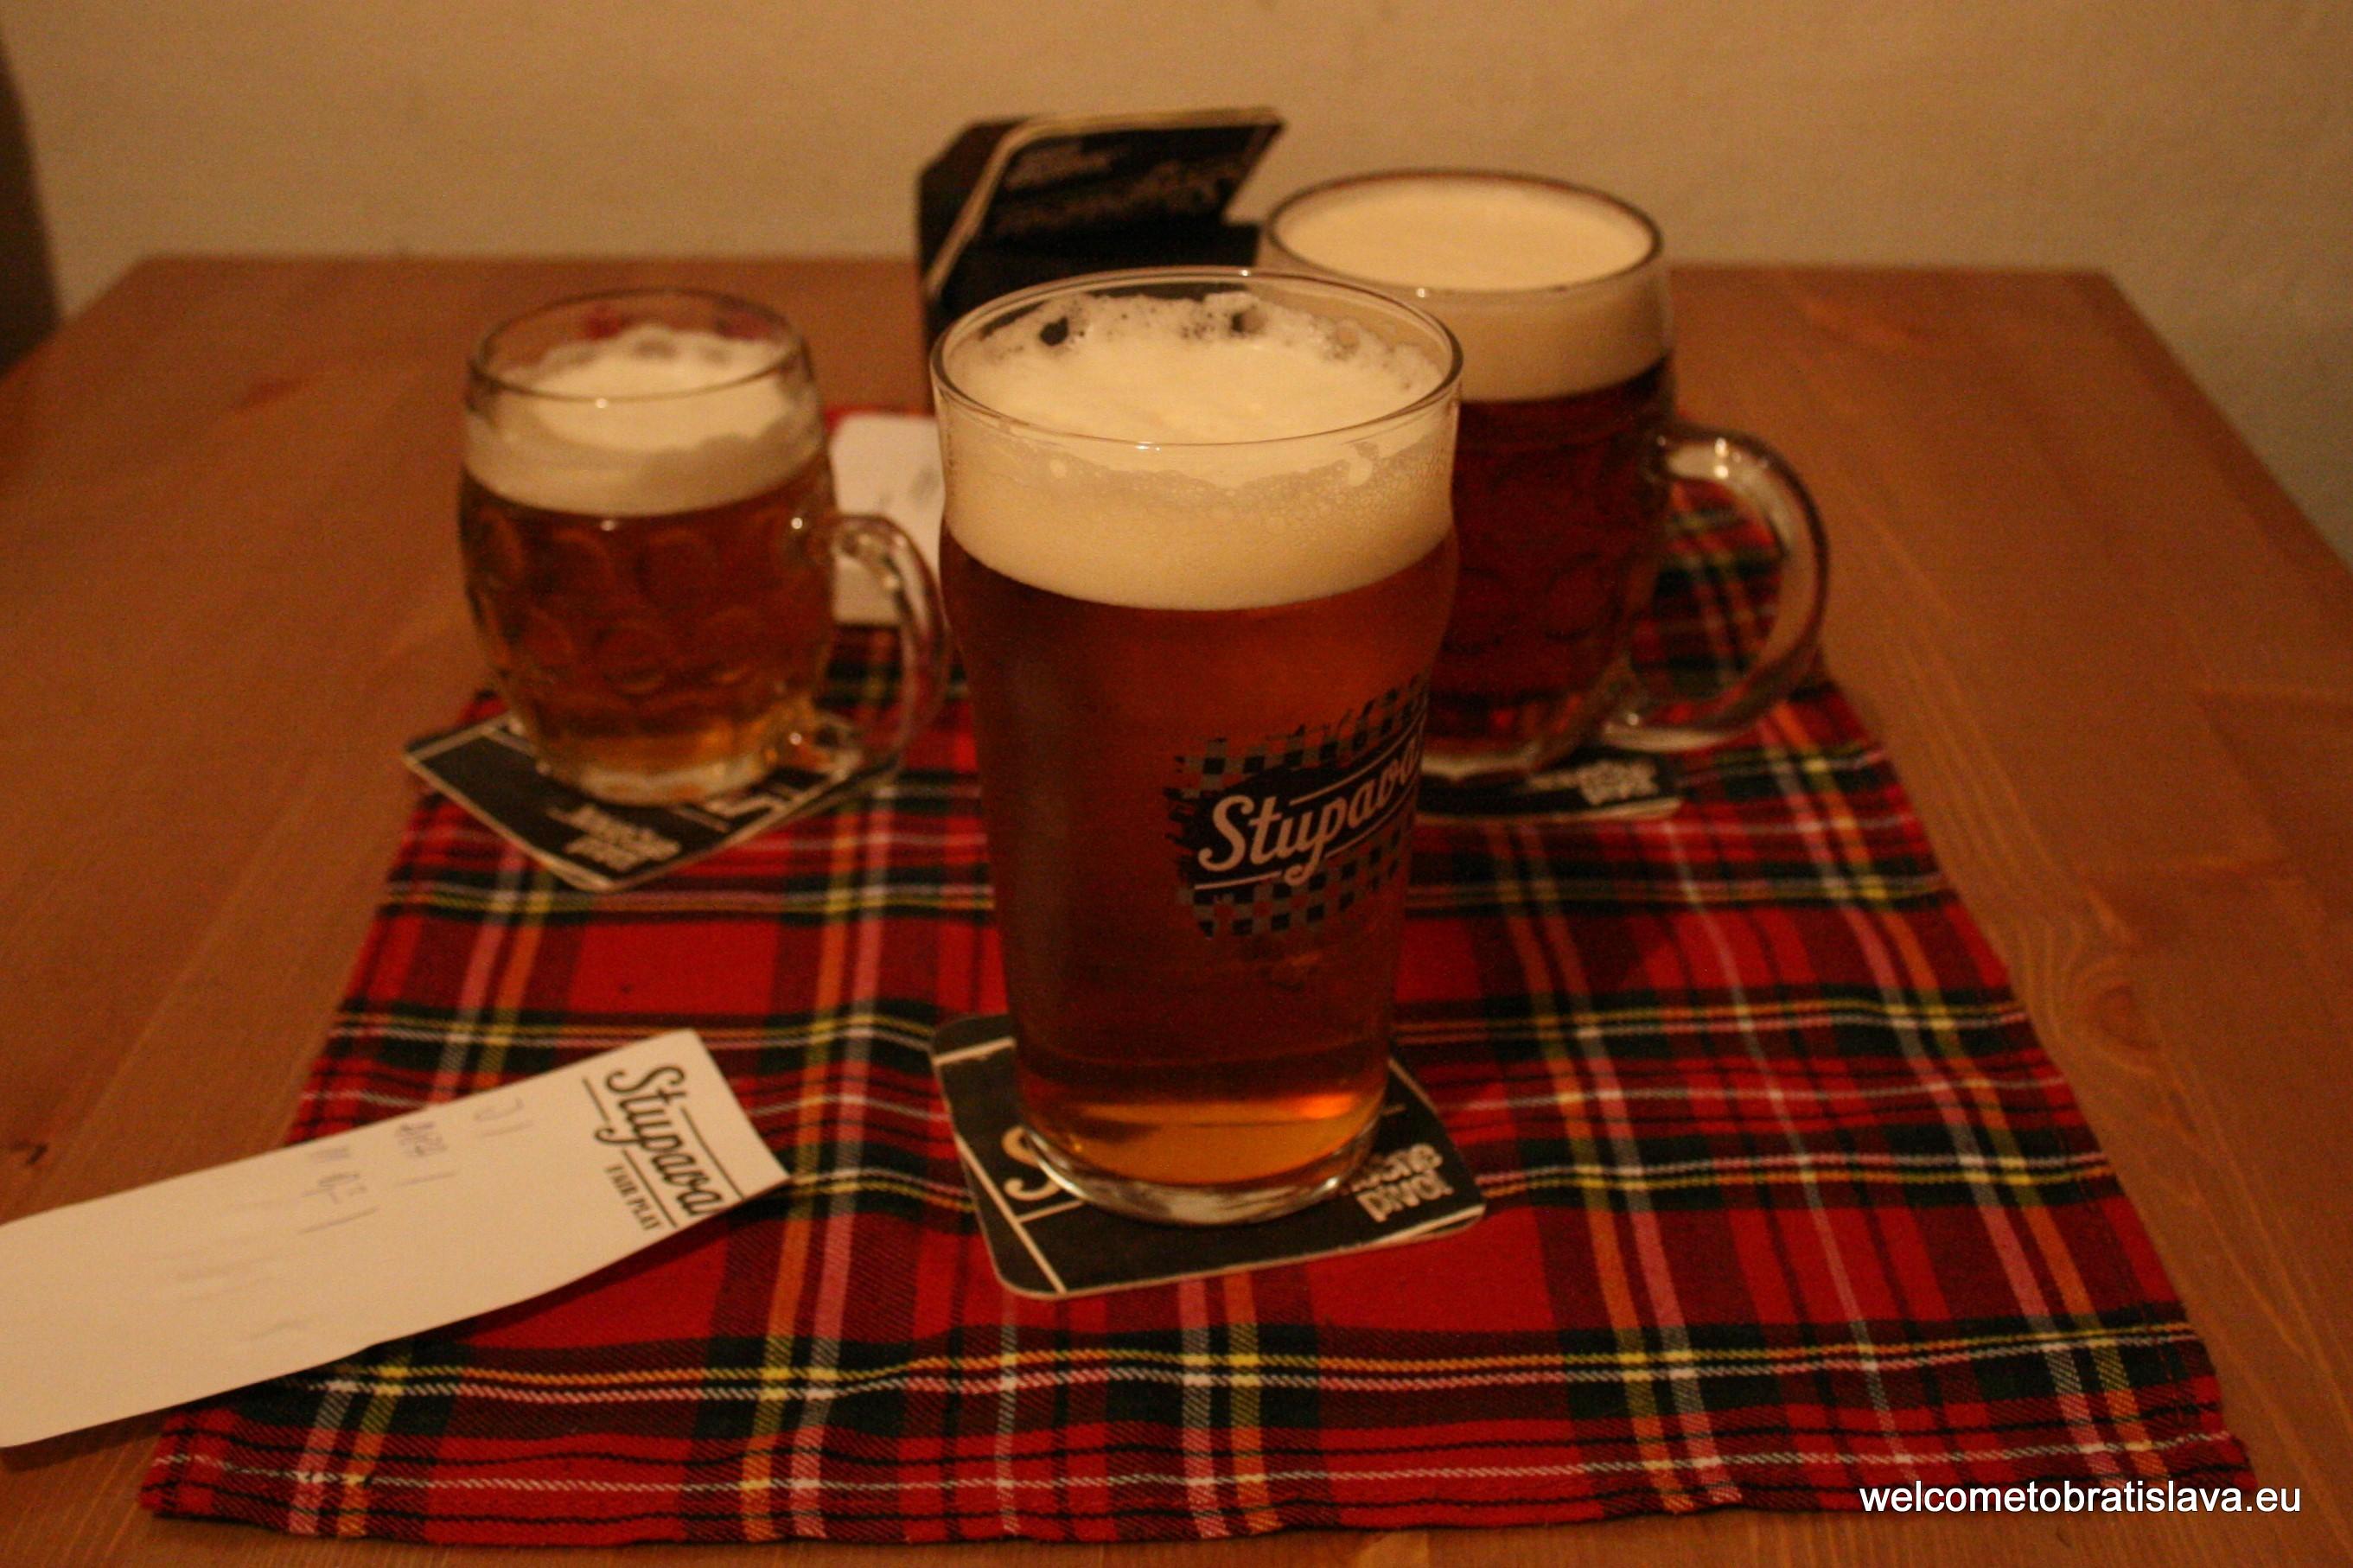 Best beer places in Bratislava - Stupavar